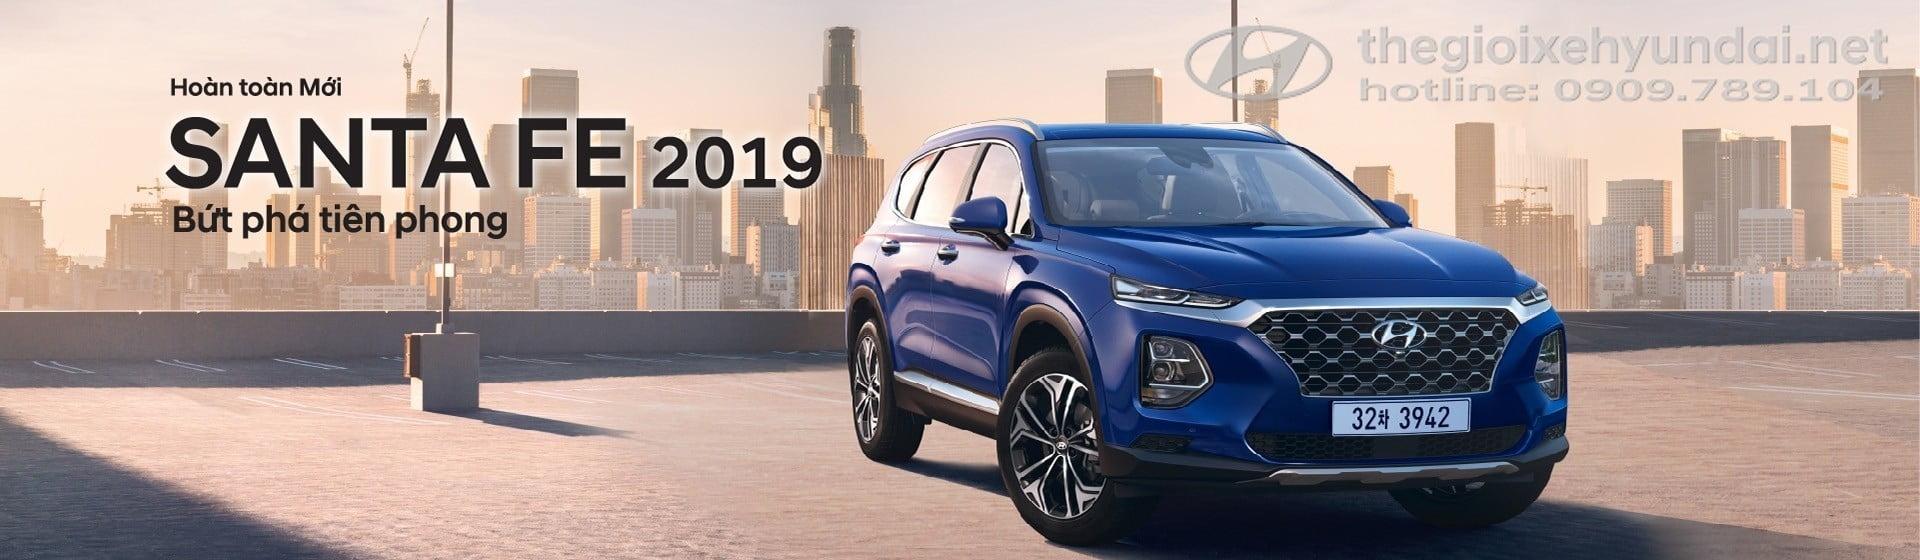 Banner Xe Hyundai Santafe 2019